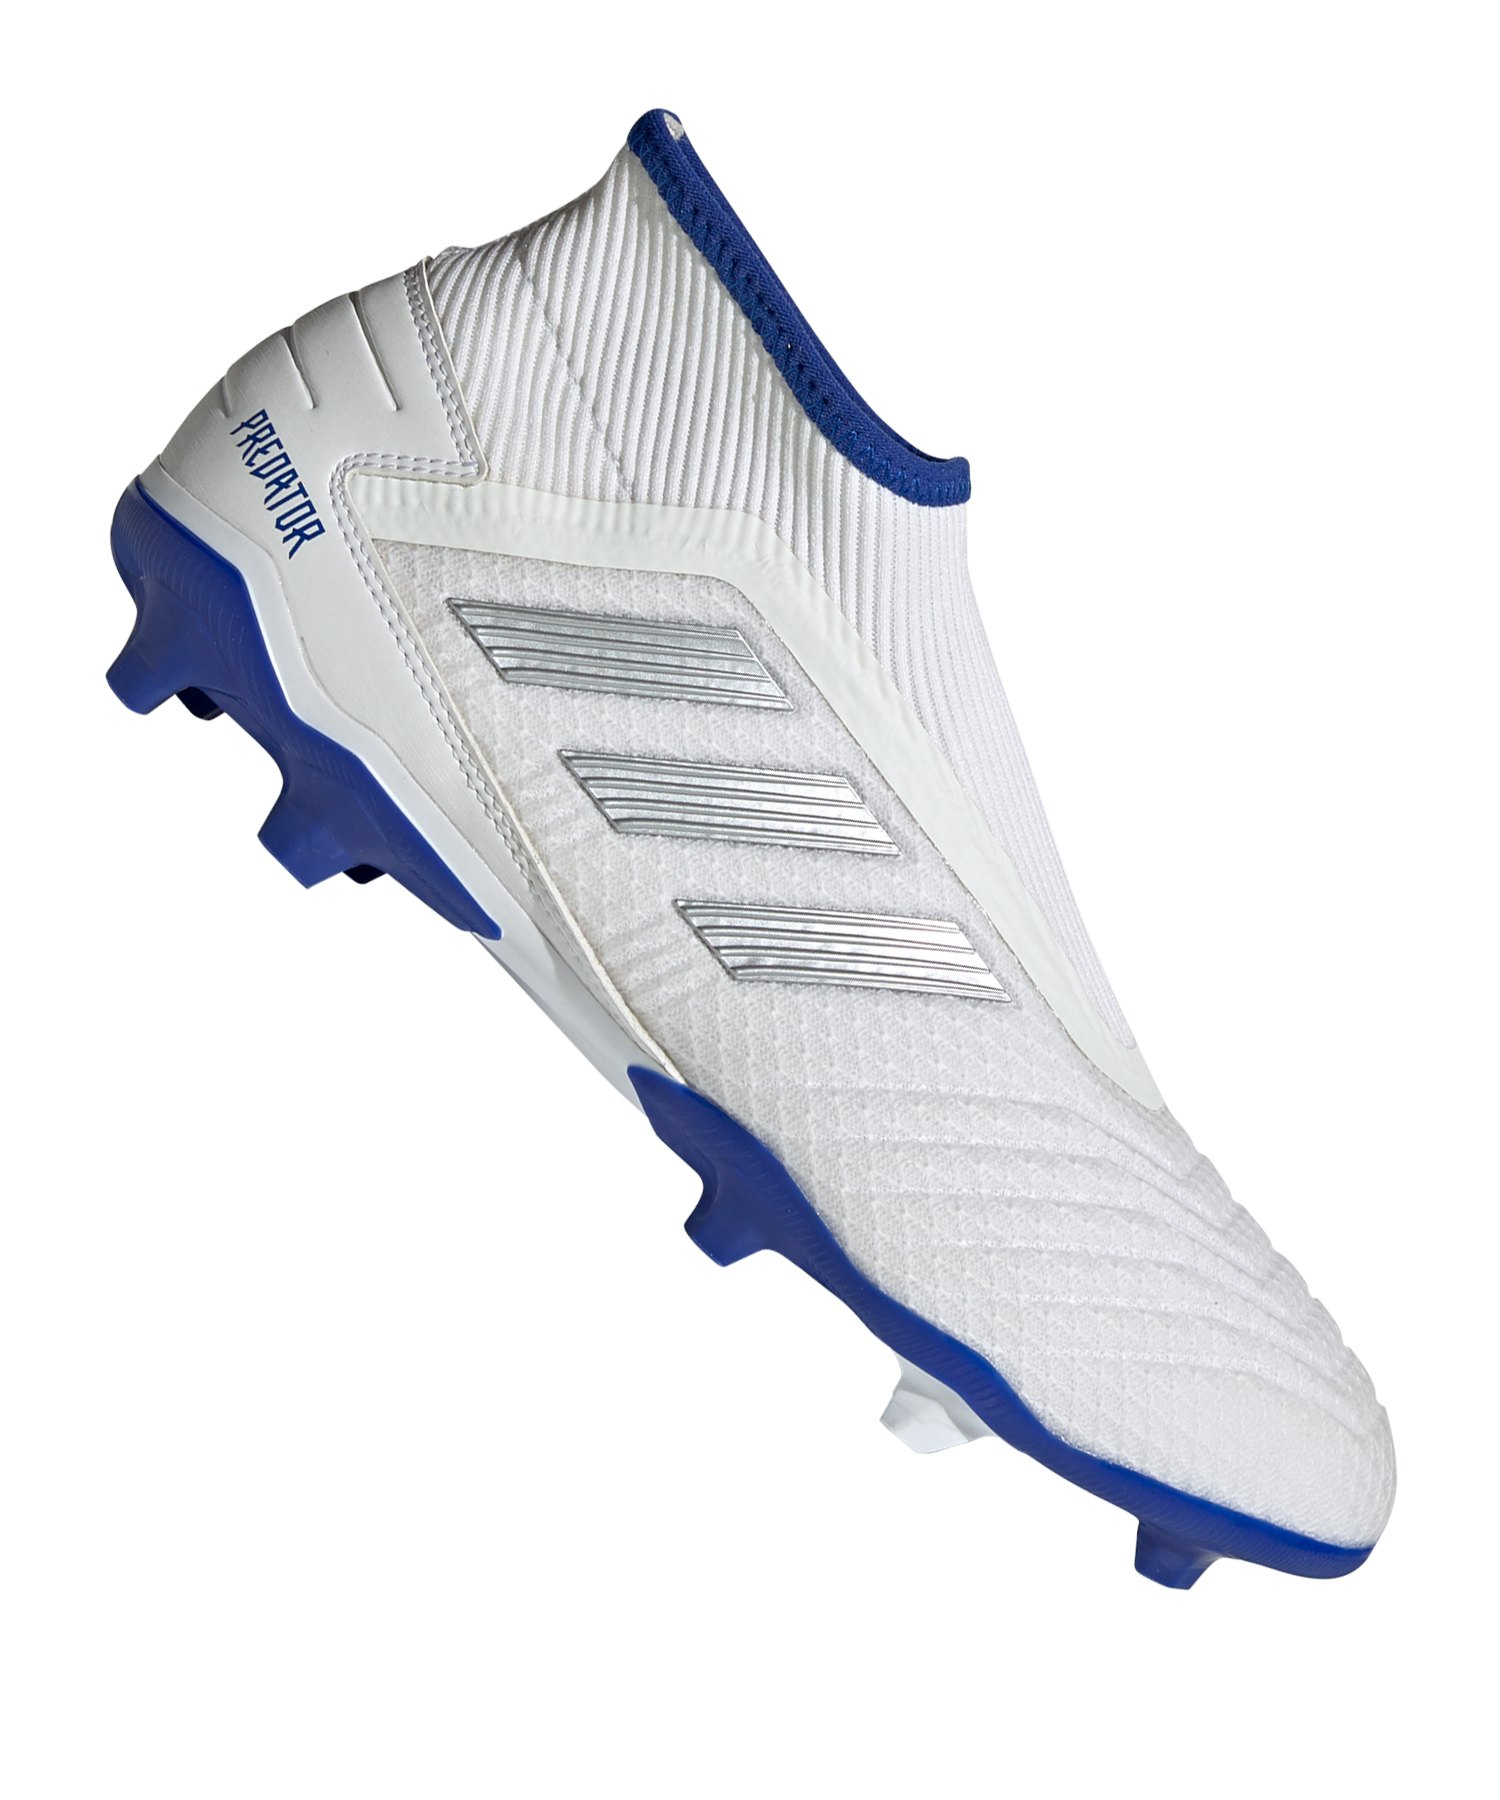 newest collection 34889 f5b99 adidas Predator 19.3 FG Weiss Silber - weiss